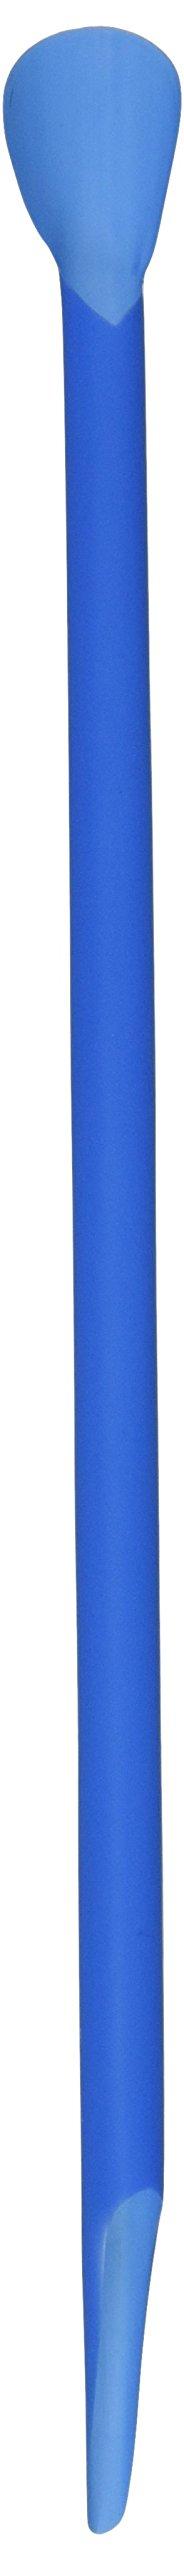 LevGo 17211 smartSpatula Disposable Polypropylene Laboratory Spatula, 210 mm (Pack of 300) by LevGo